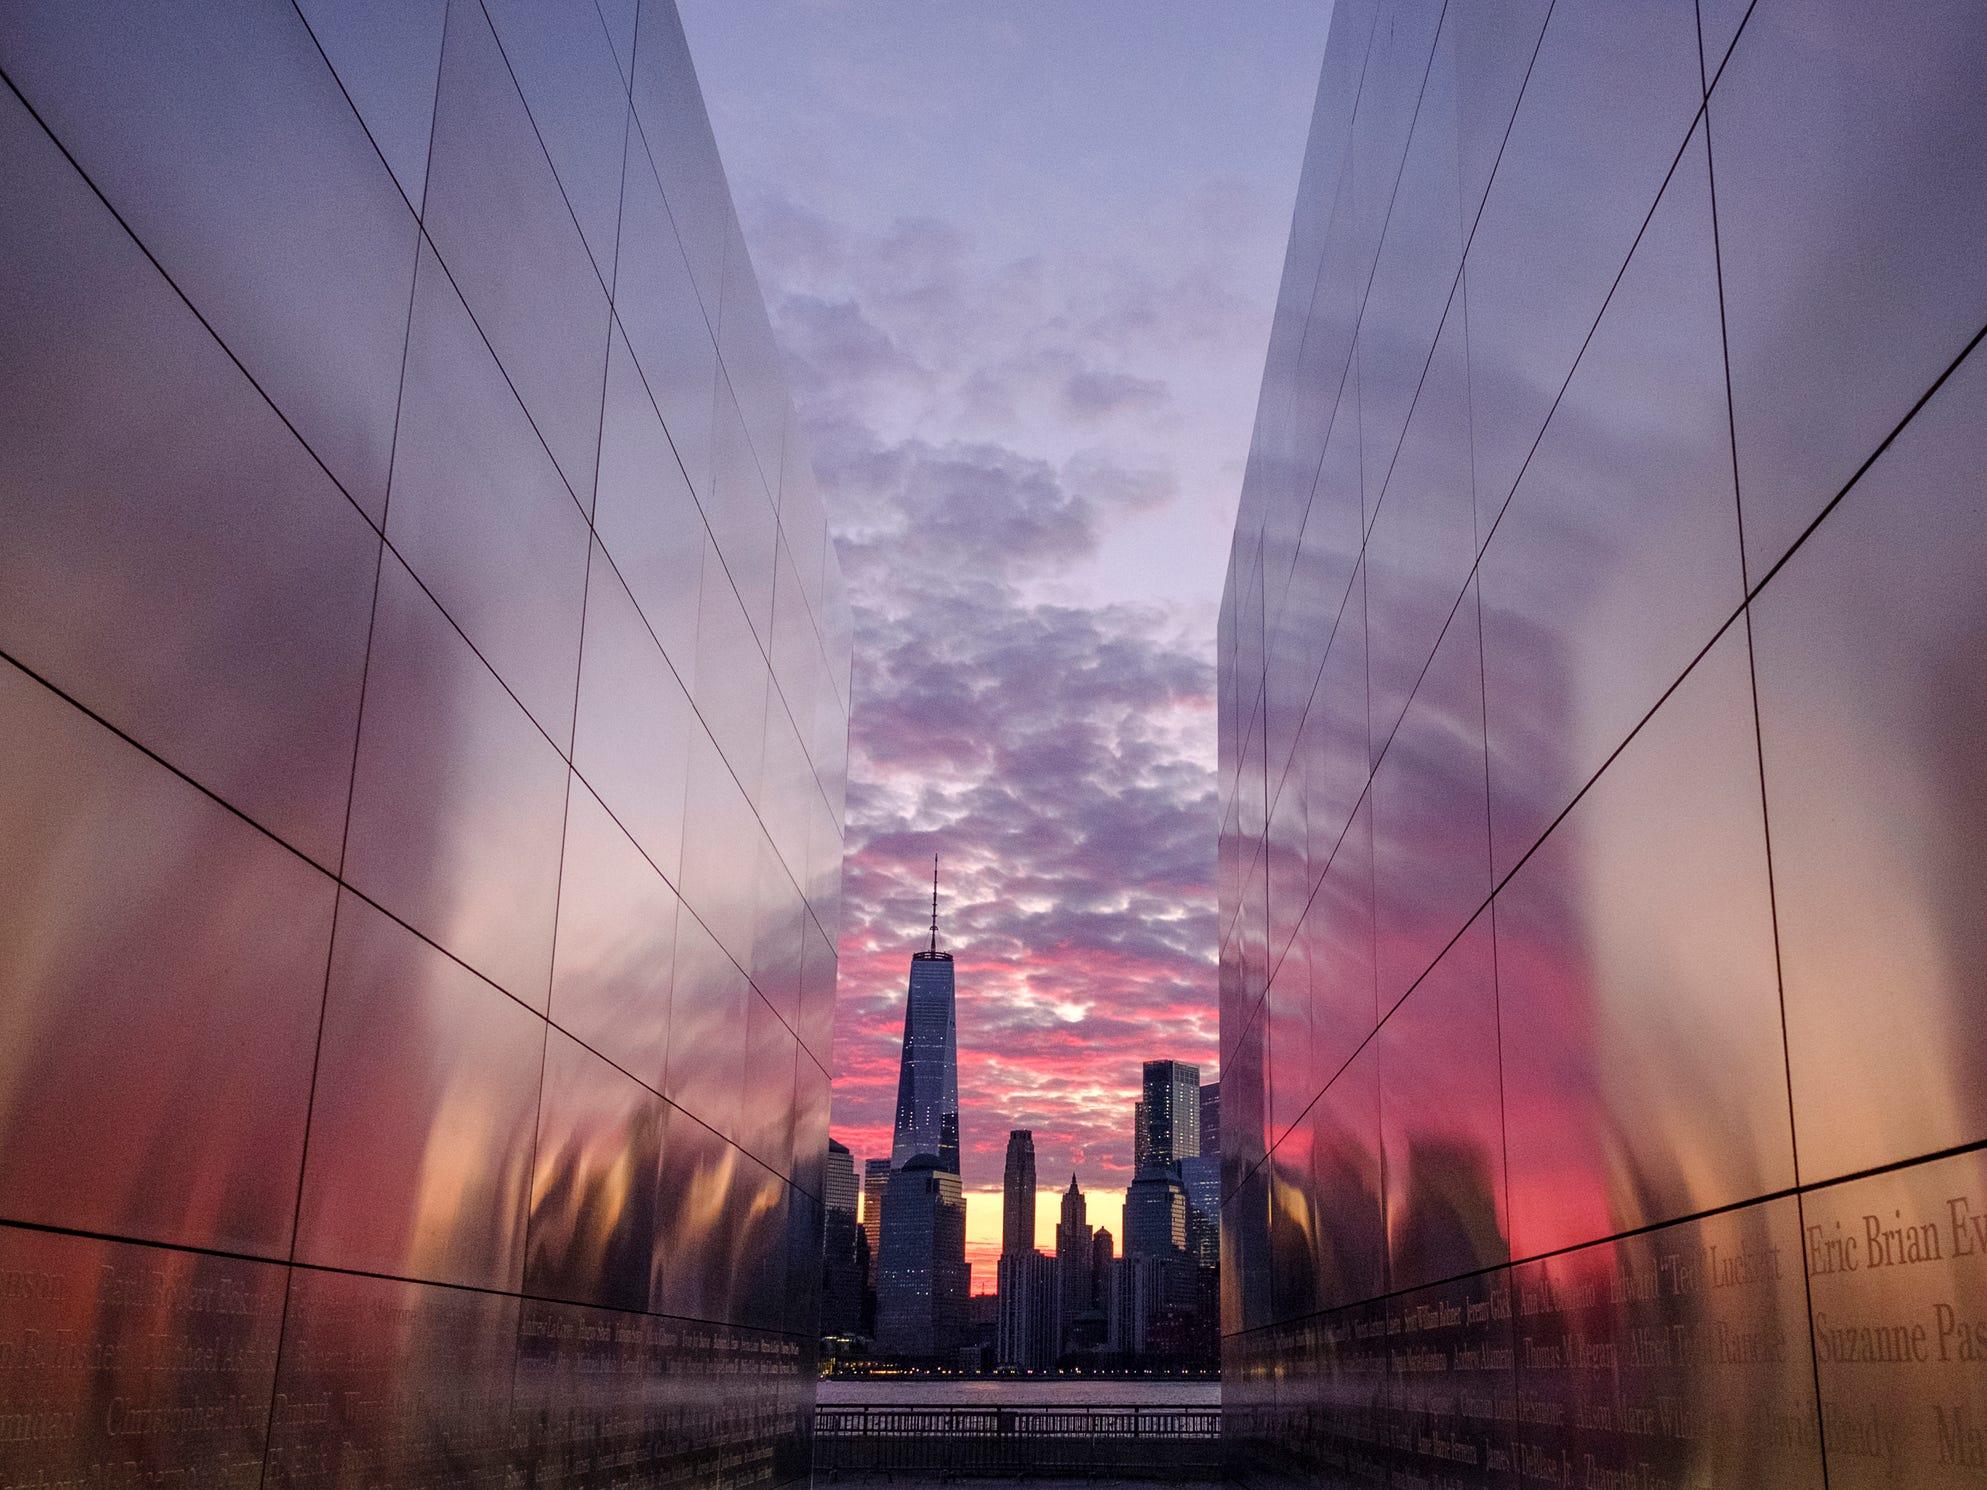 Framed through the Empty Sky Memorial in Jersey City, N.J., sunrise lights up the sky behind the New York City skyline Thursday, April 11, 2019.